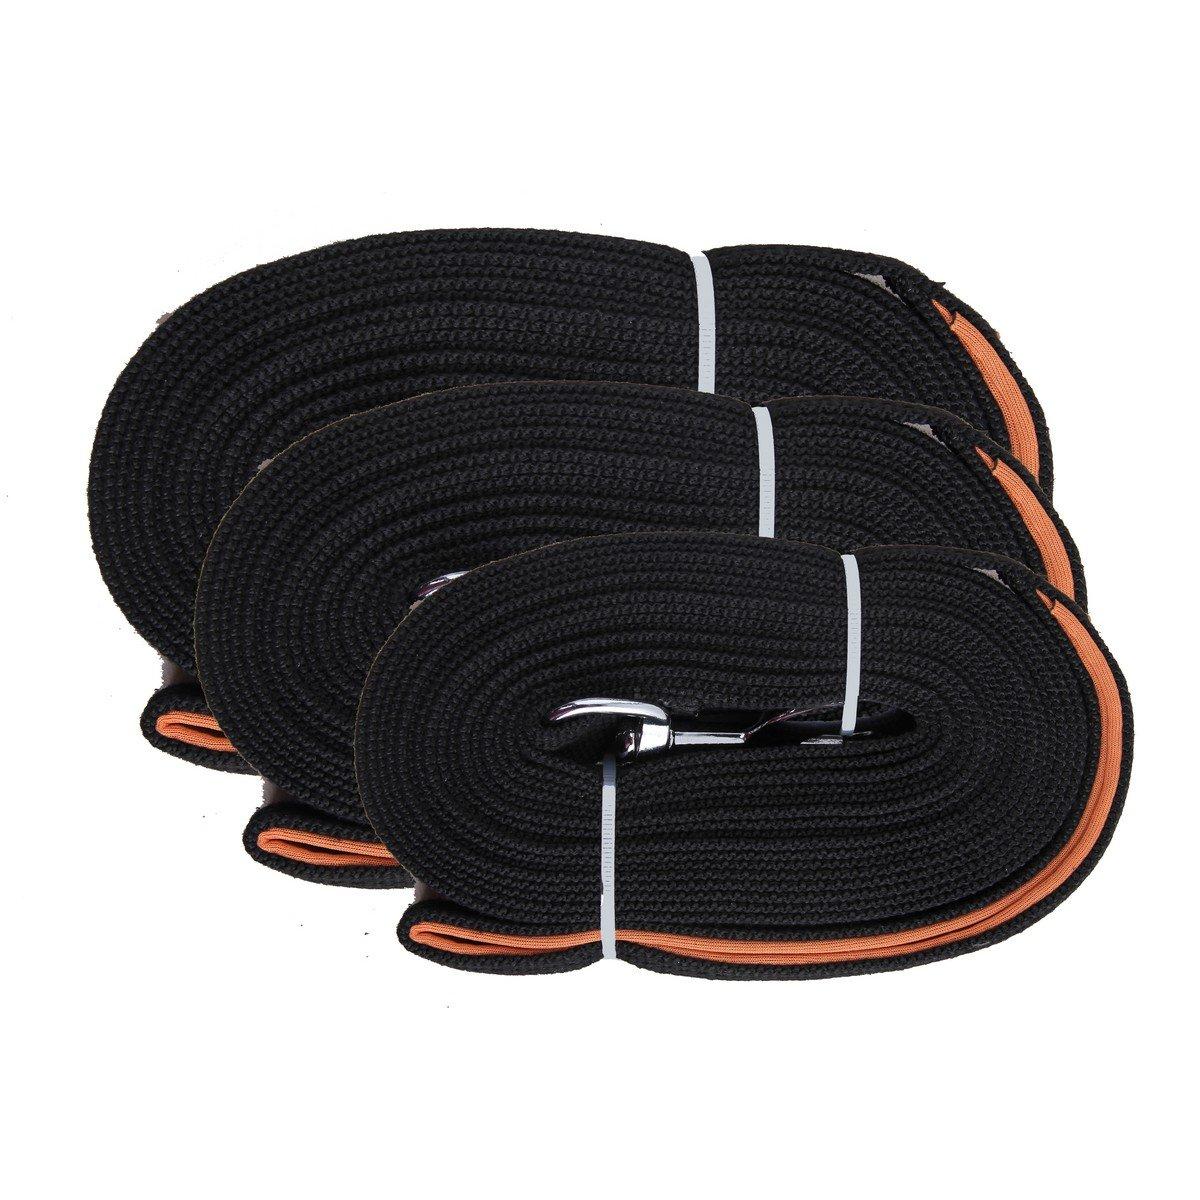 Imagem de Agradi Flat Leash with Loop 5m Black 5m